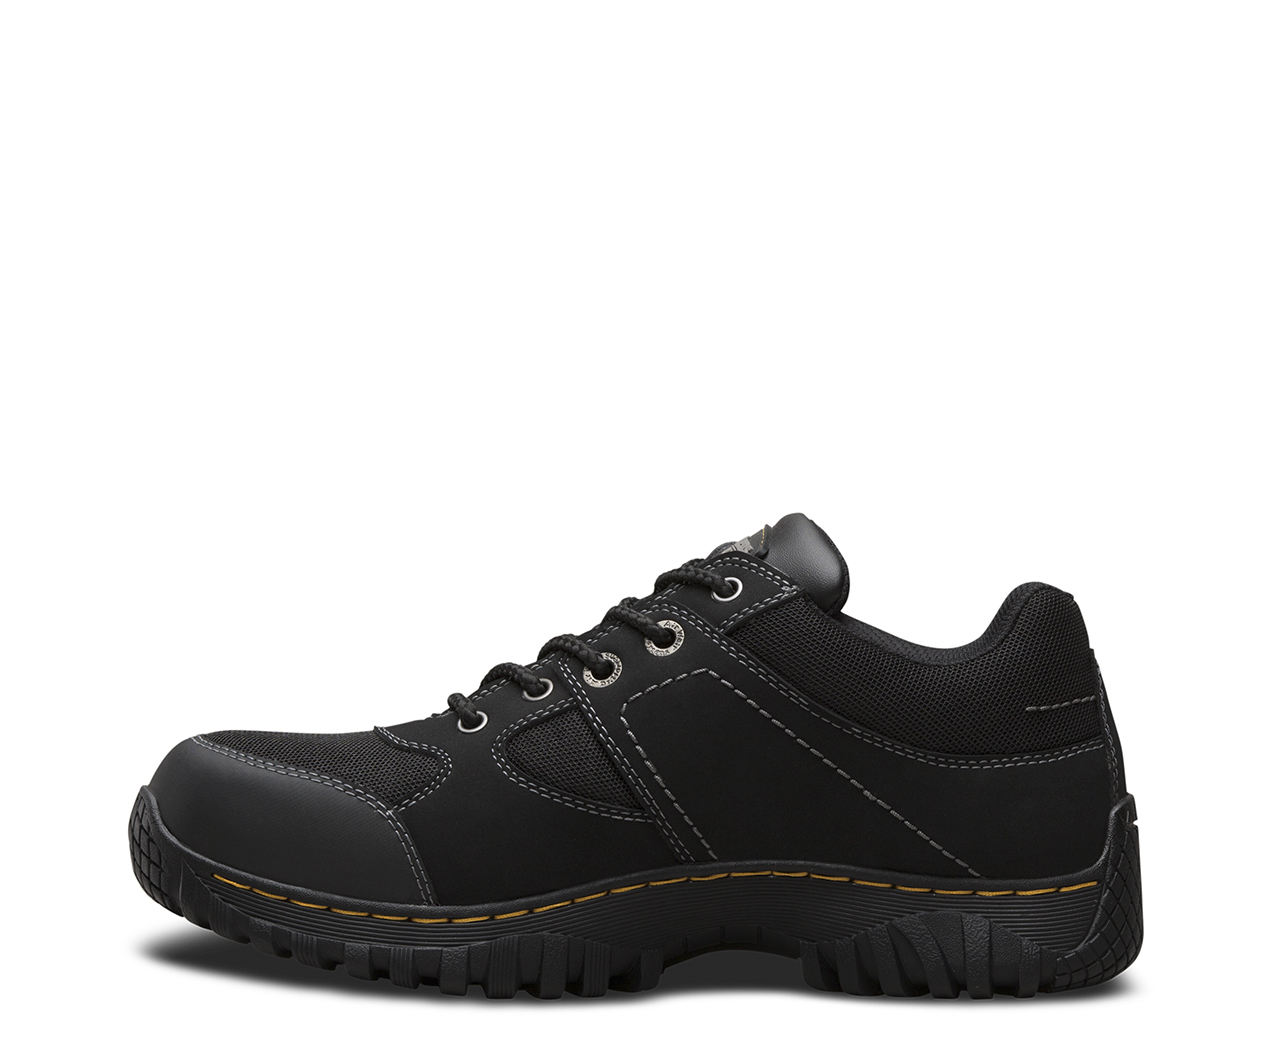 GUNALDO ST BLACK 16247001